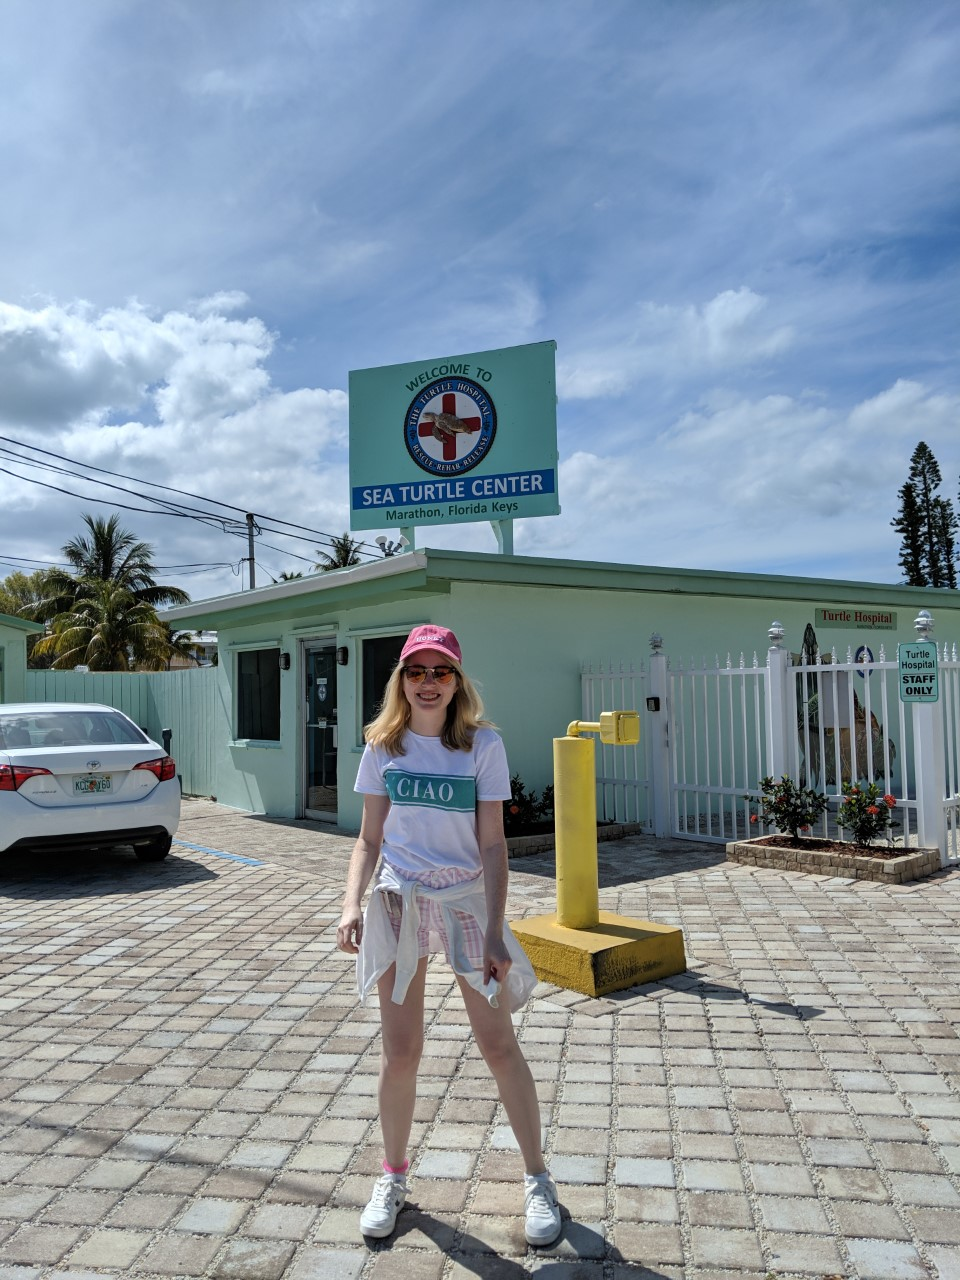 outside the turtle hospital in marathon, florida